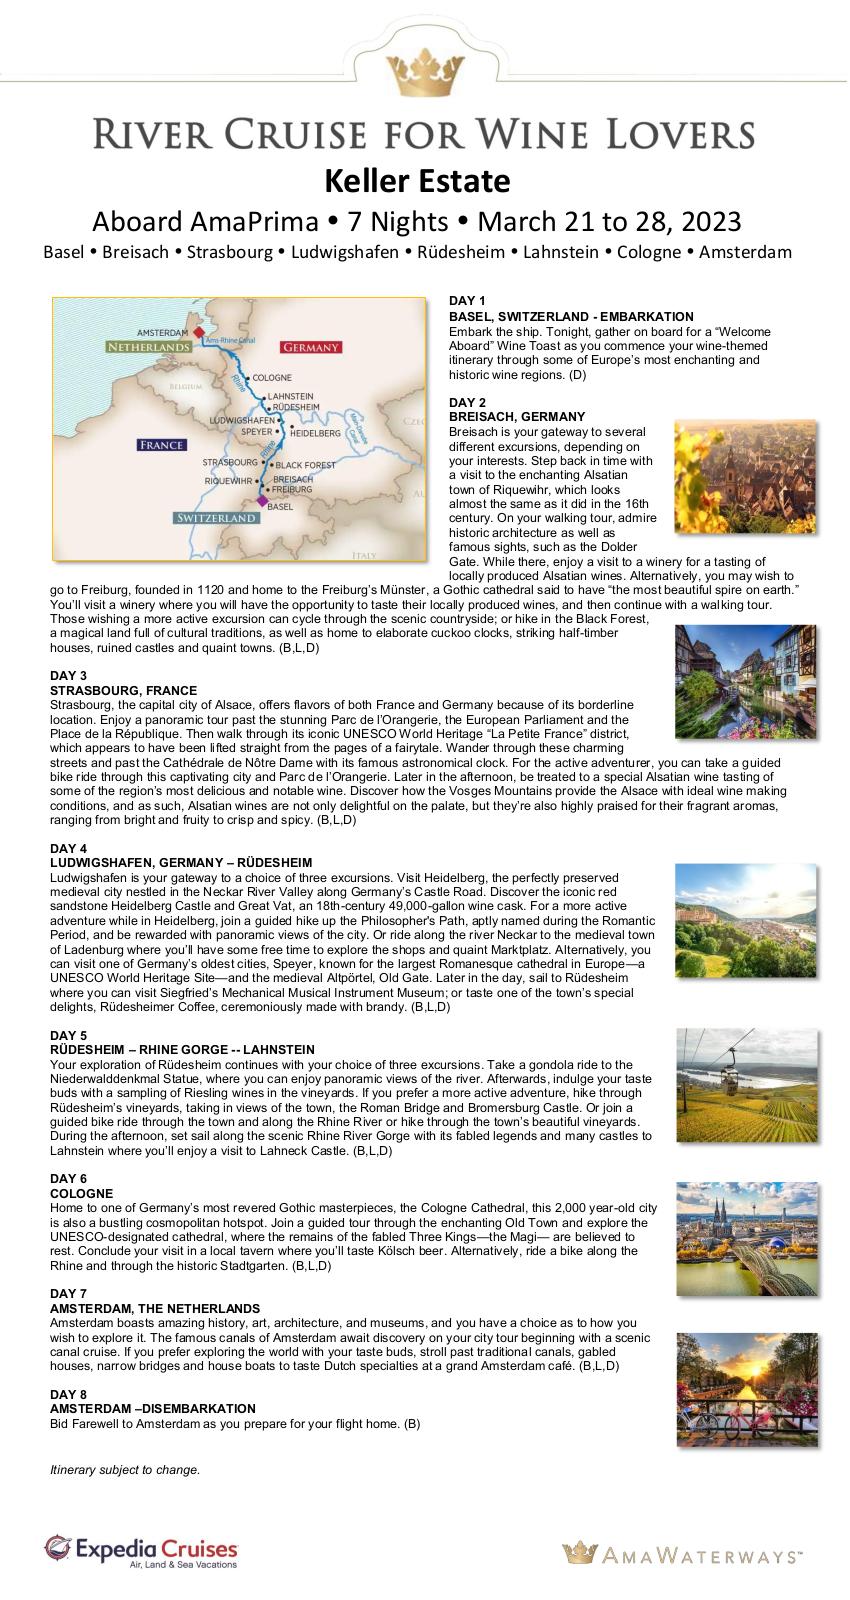 Itinerary - Keller Estate 2023 Rhine